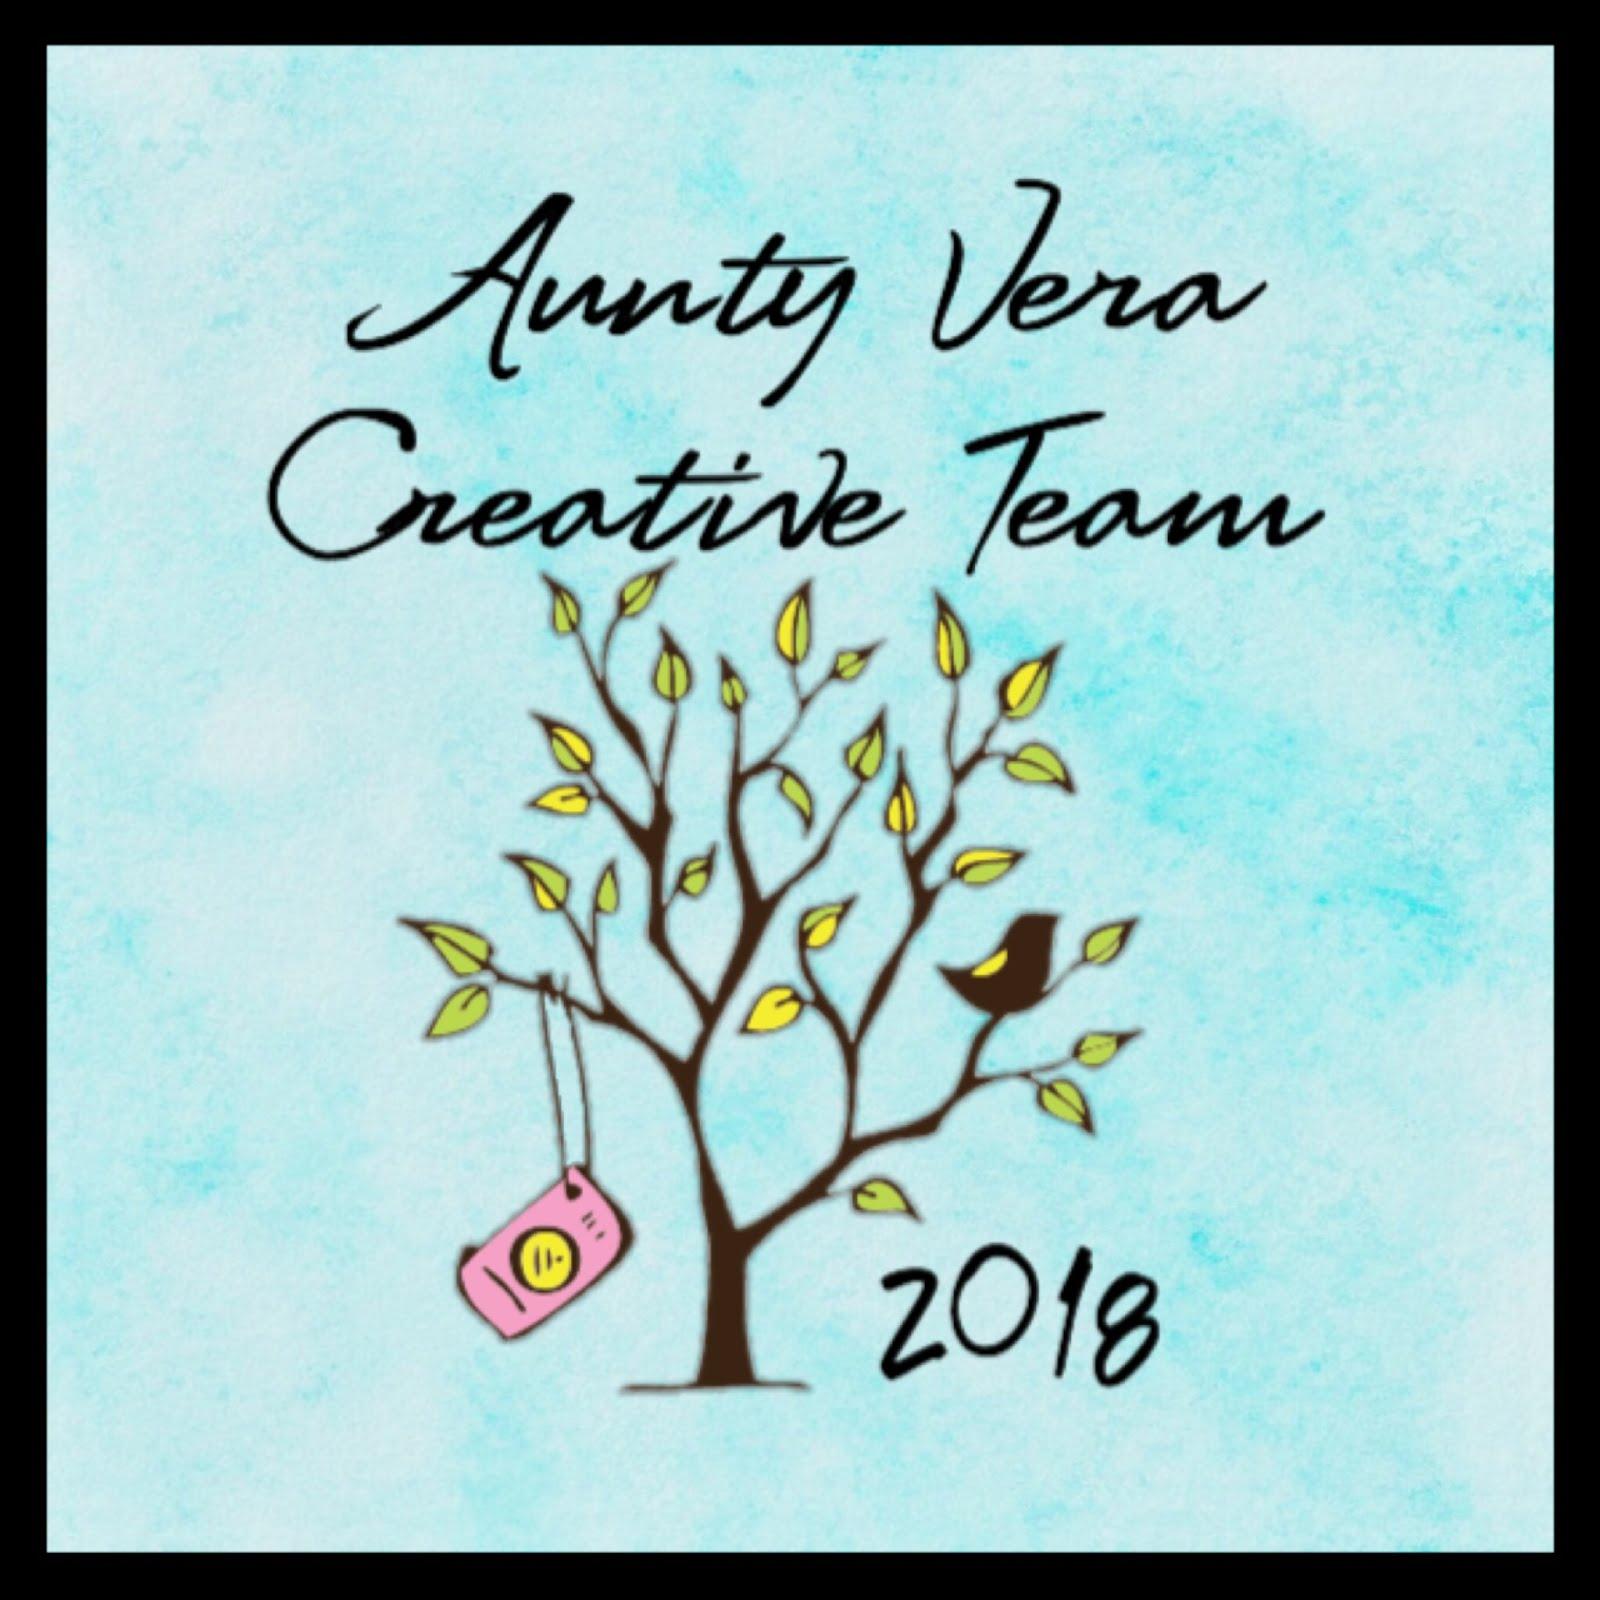 I am on the Creative Team for 2018